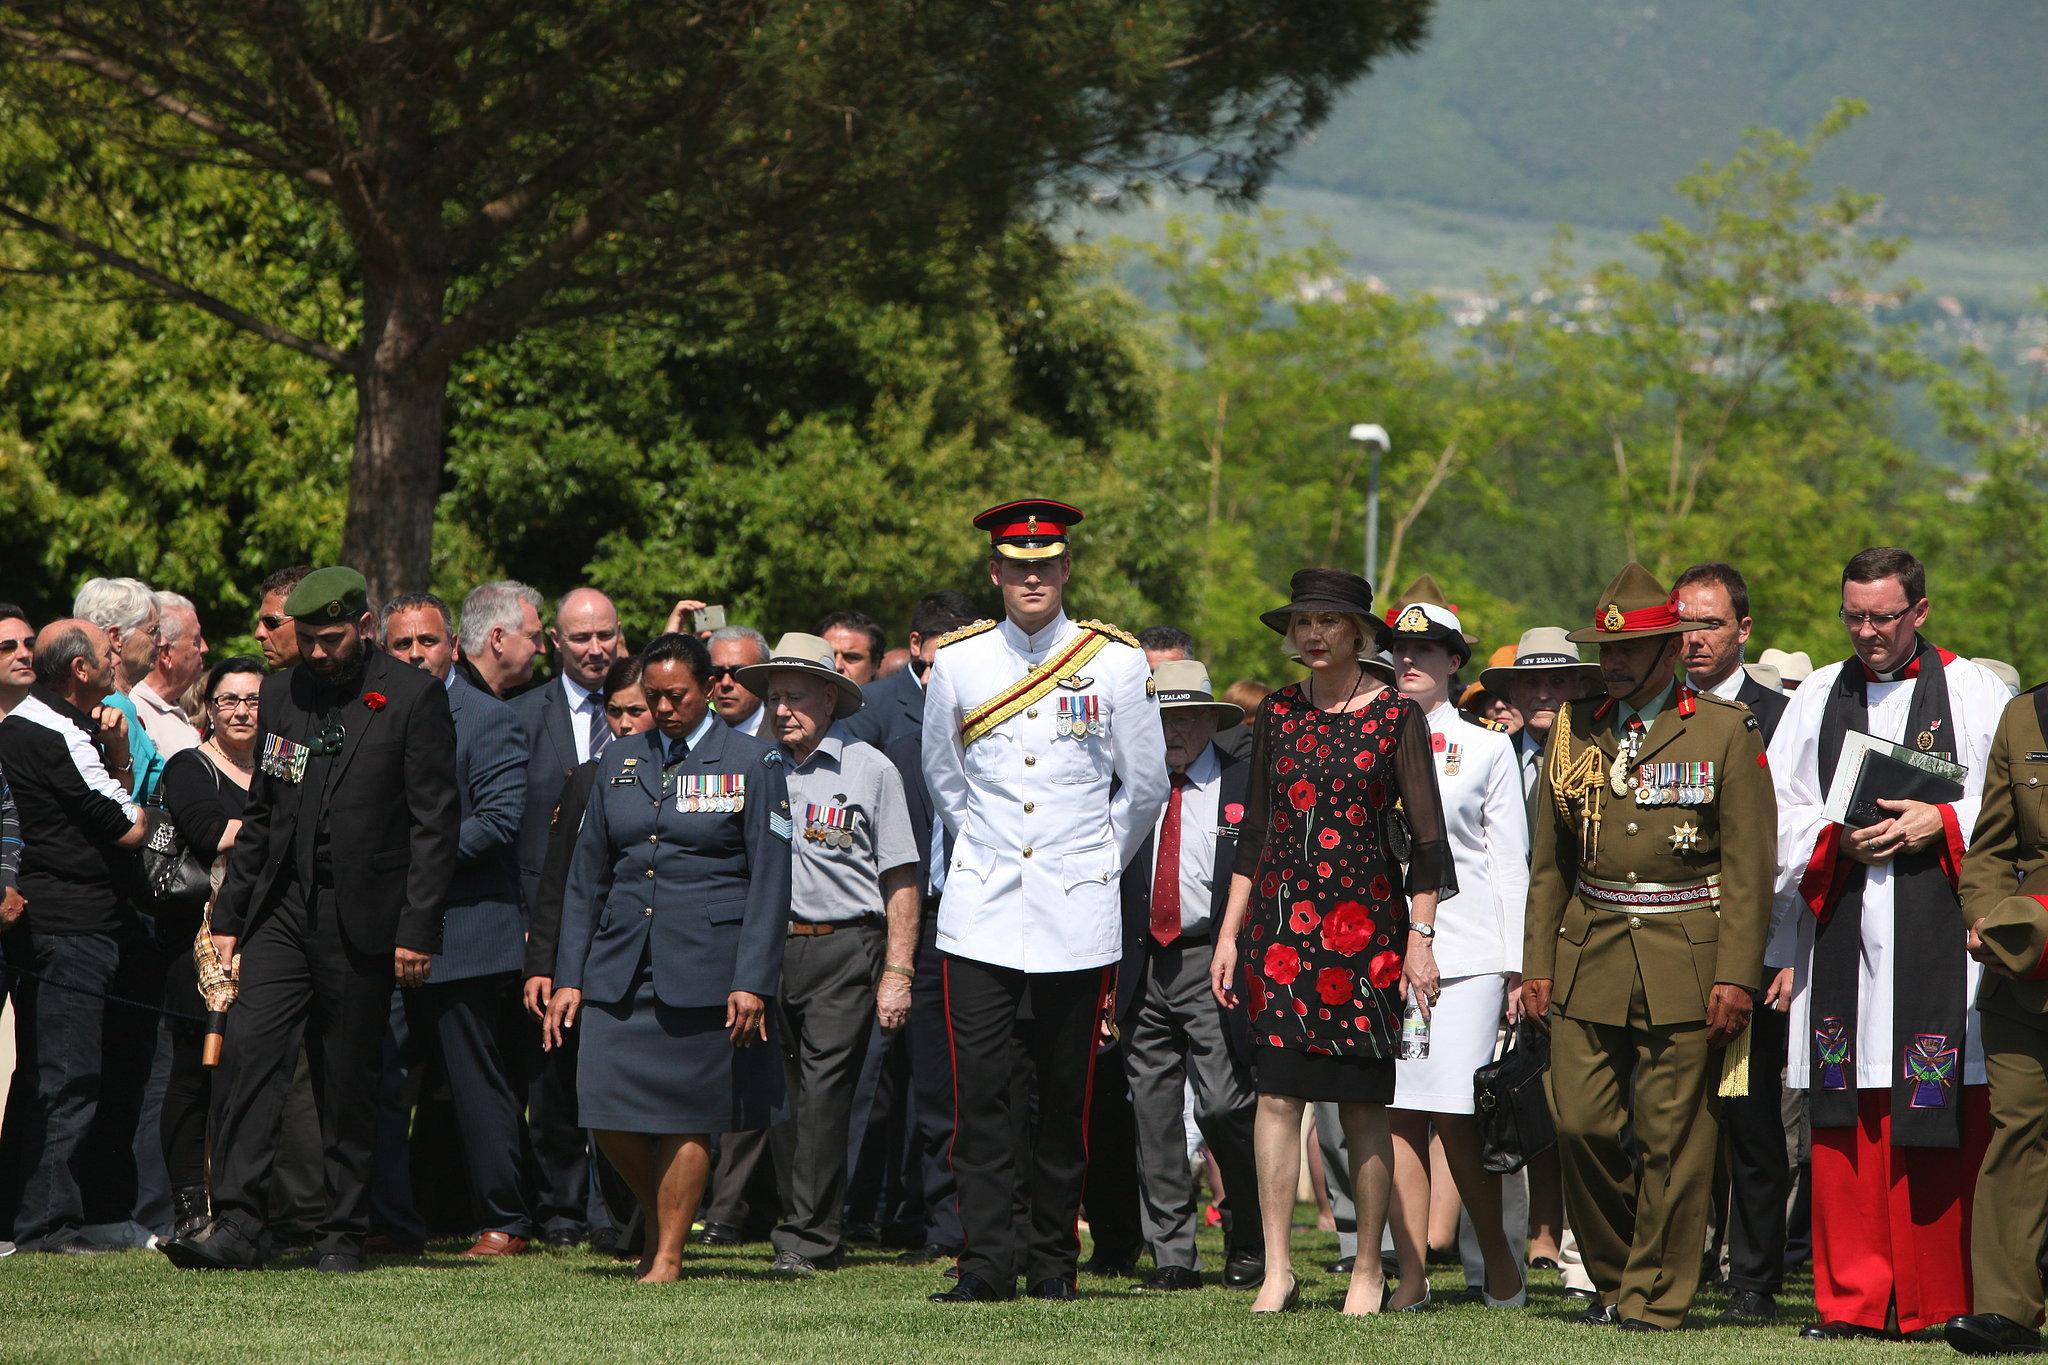 Amid Hookup Rumors, Prince Harry Fulfills His Royal Duties